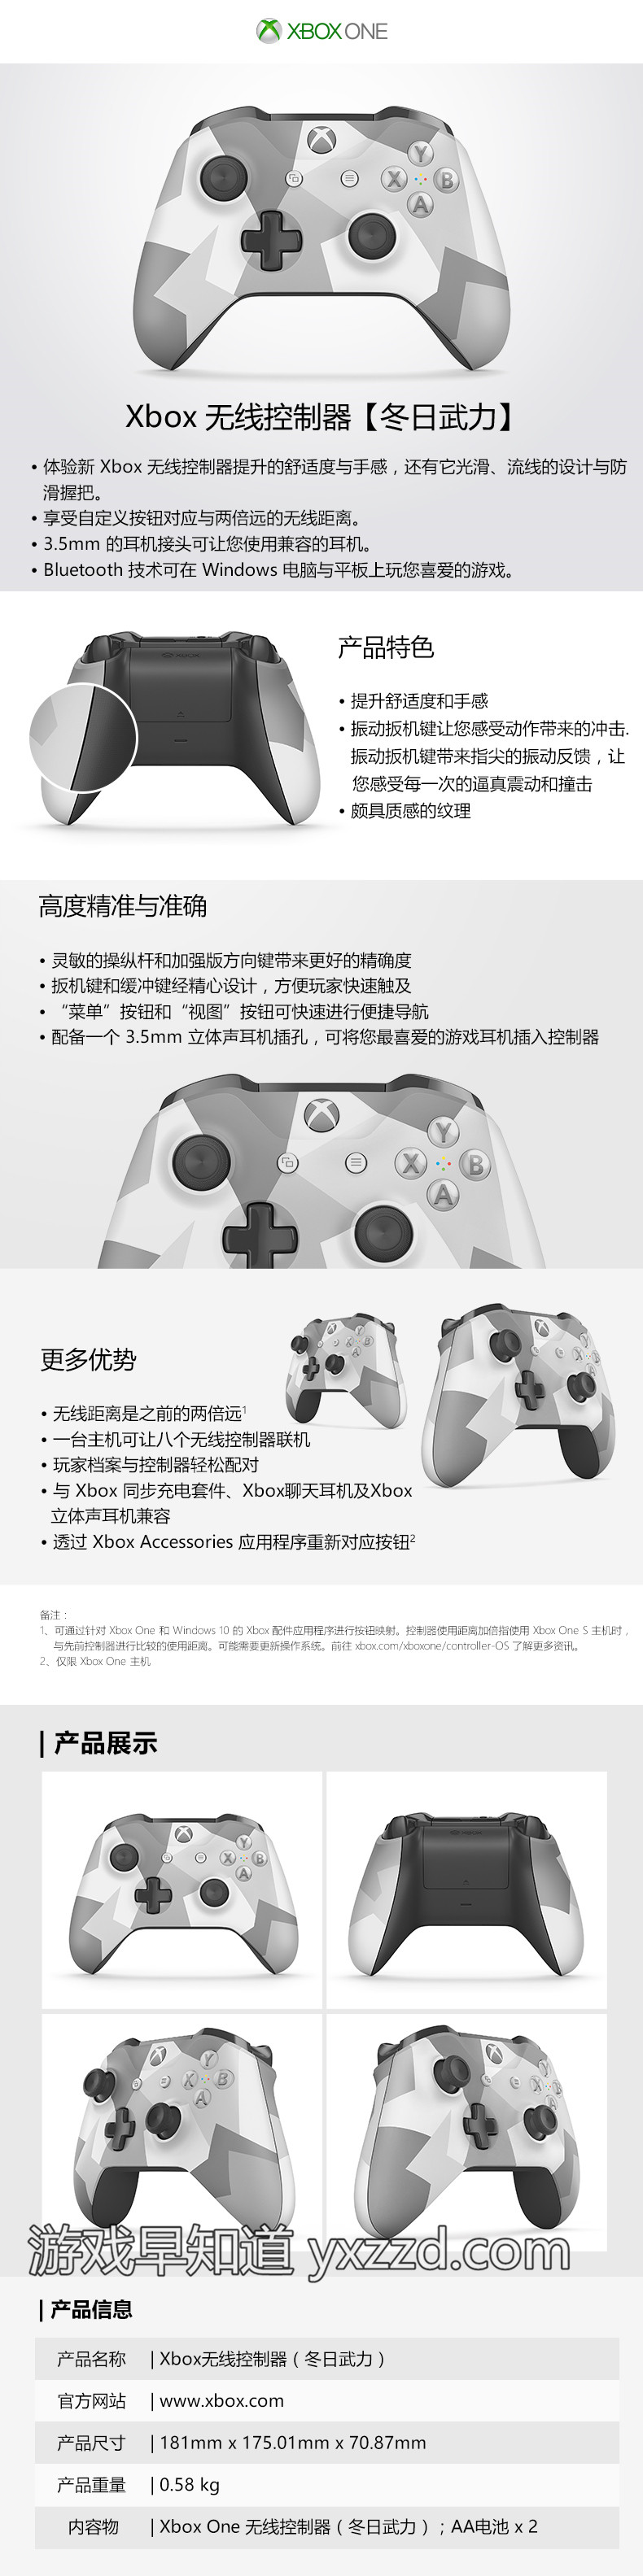 XboxOne手柄